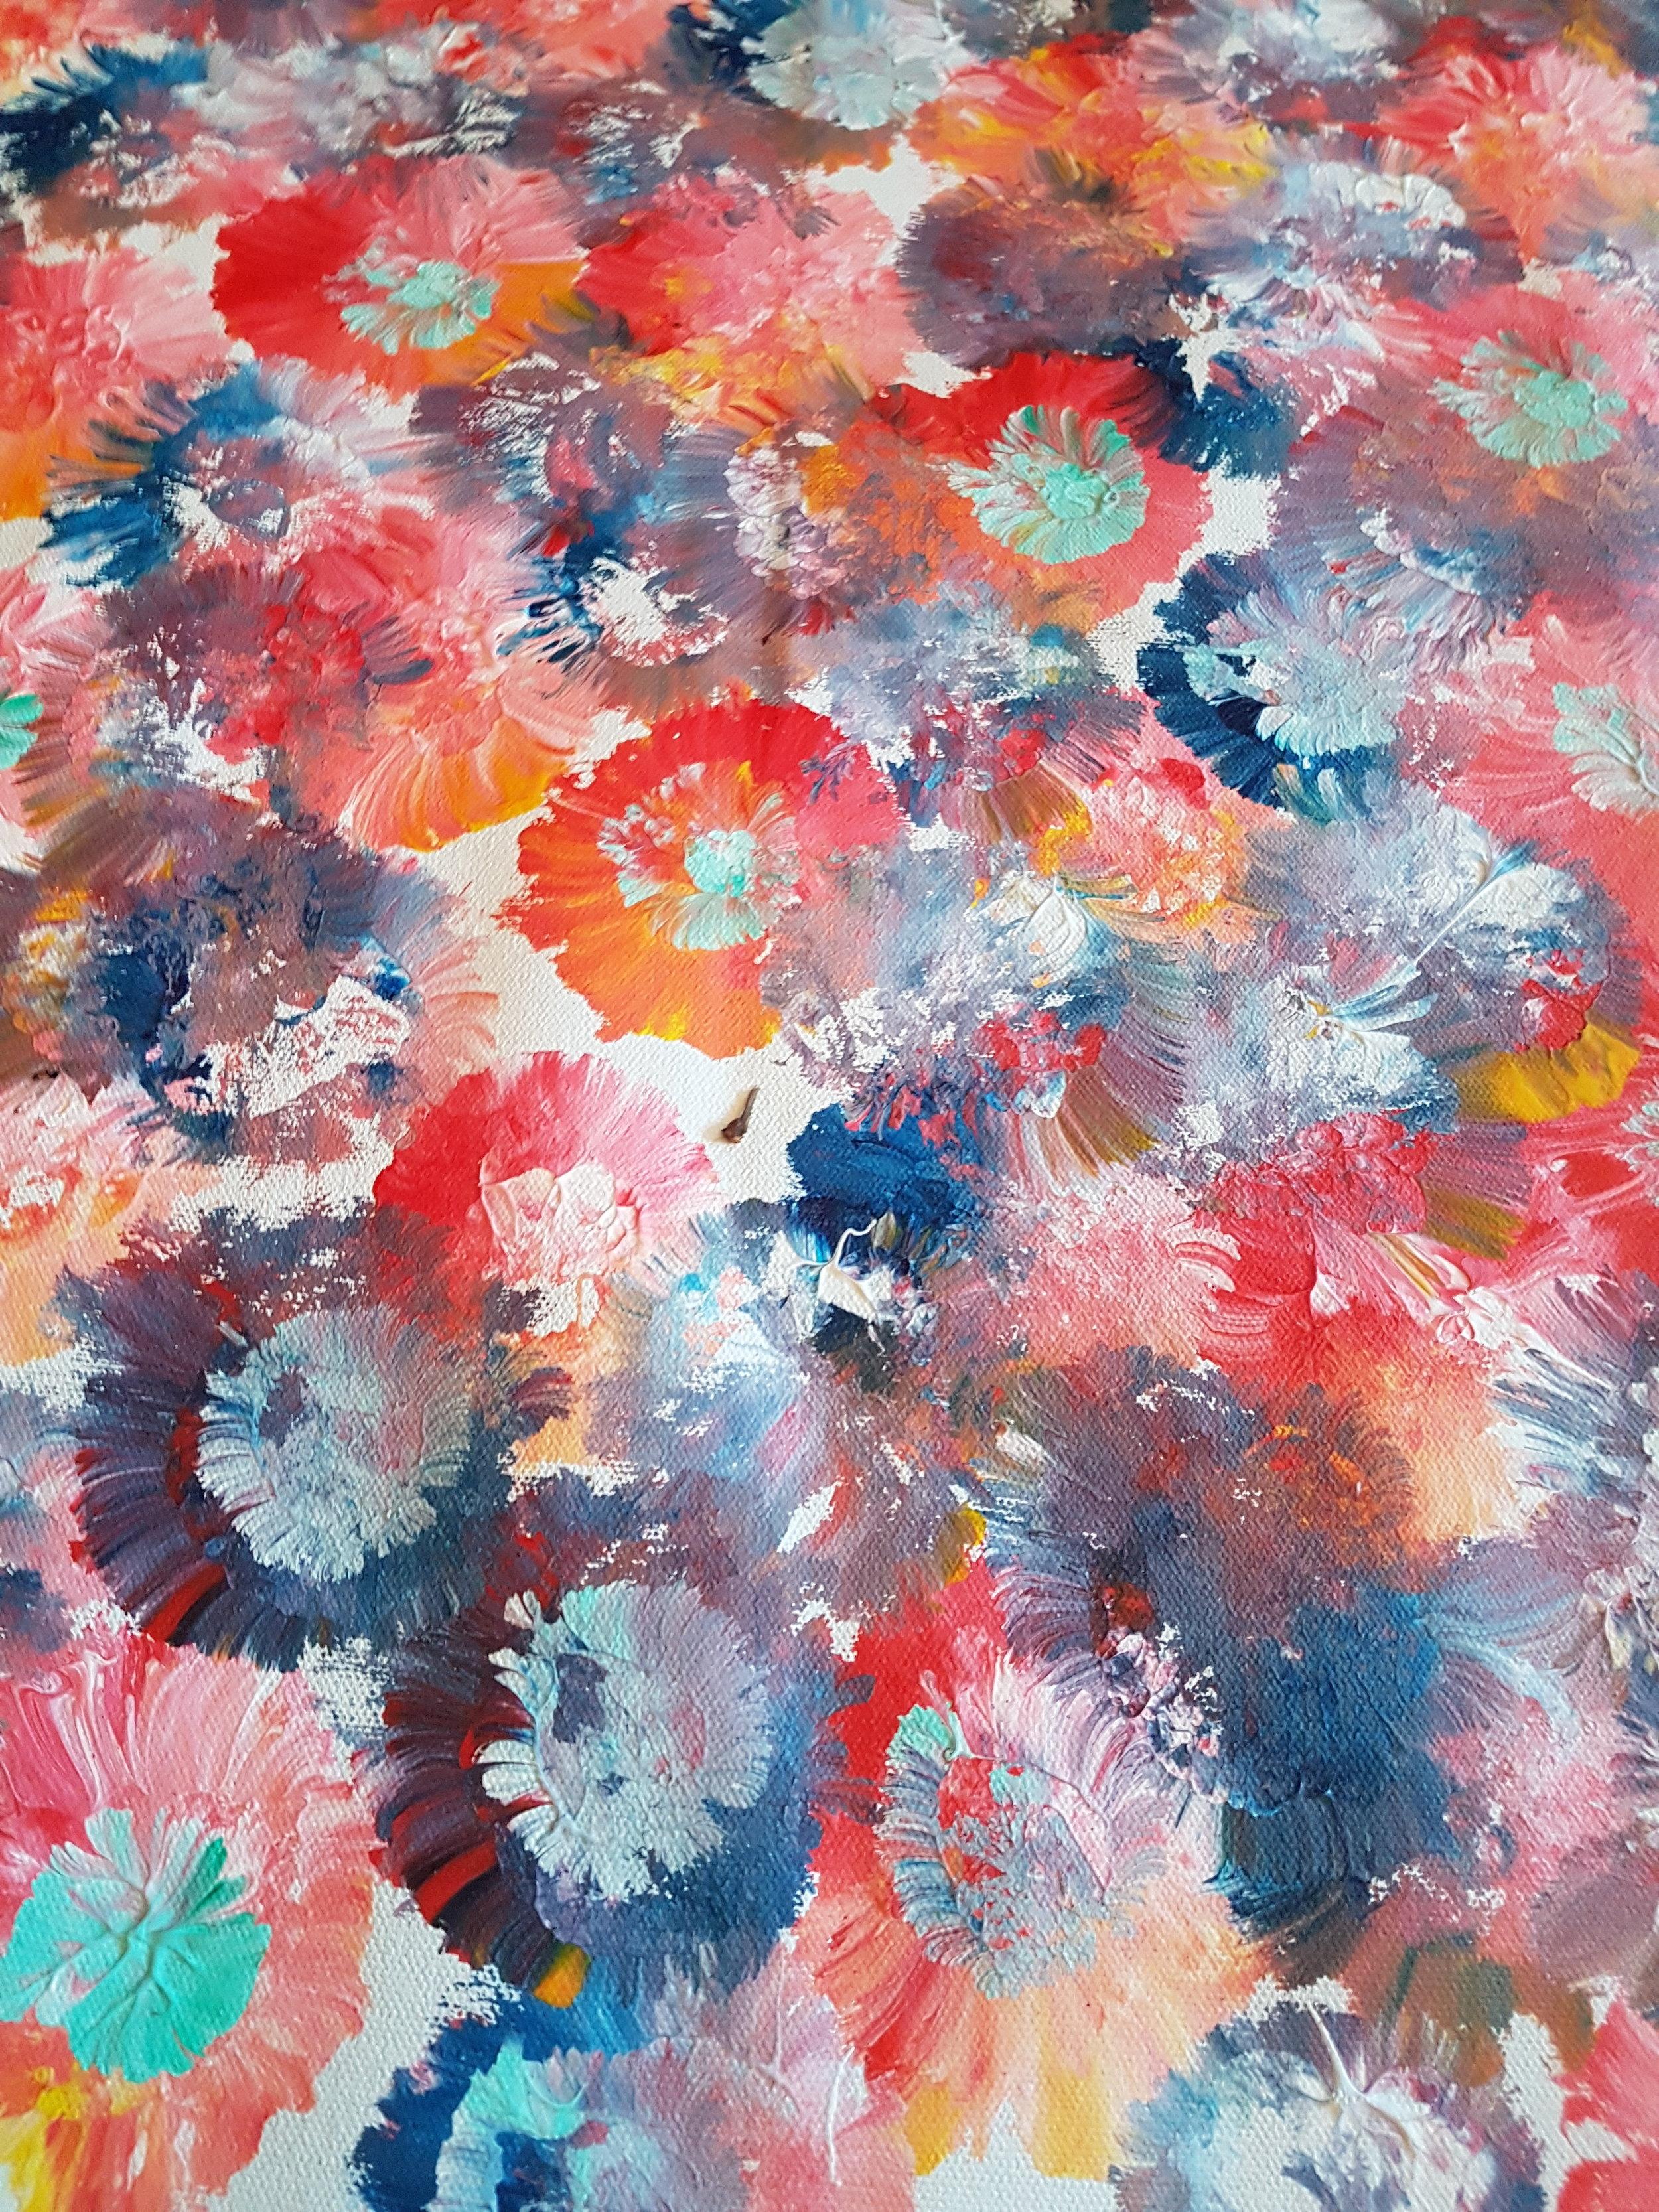 Burst of Flowers by Robert